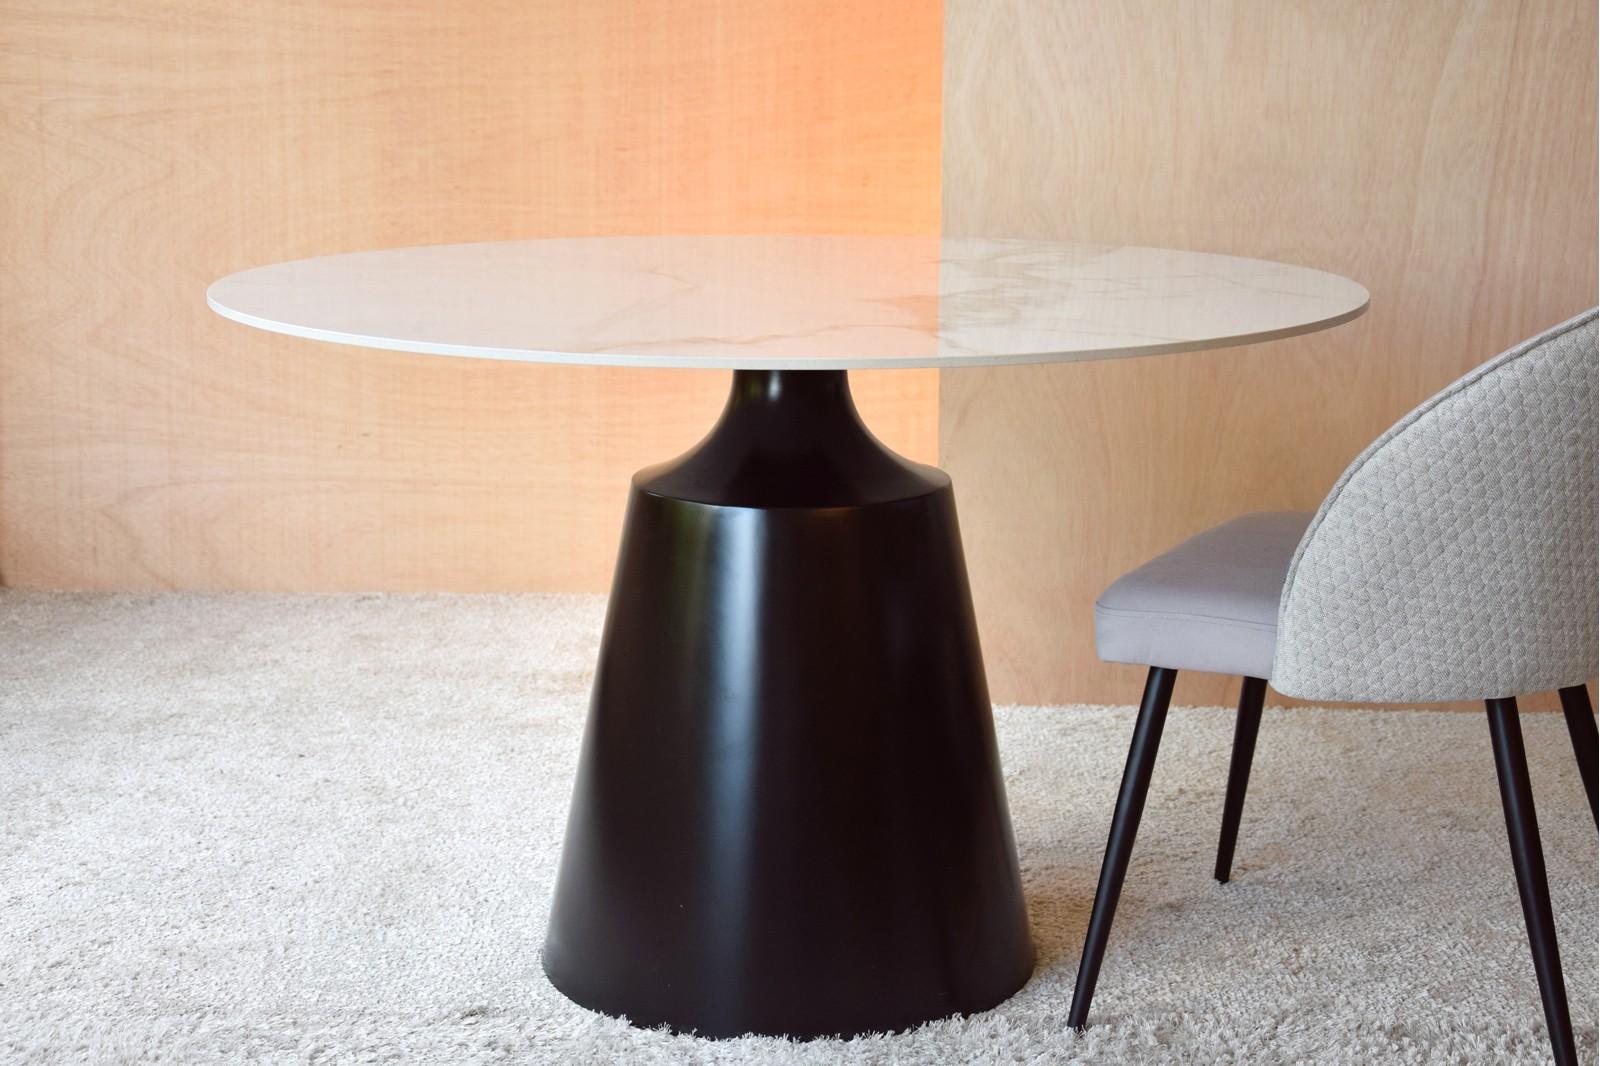 ROUND DINING TABLE. CERAMIC TOP